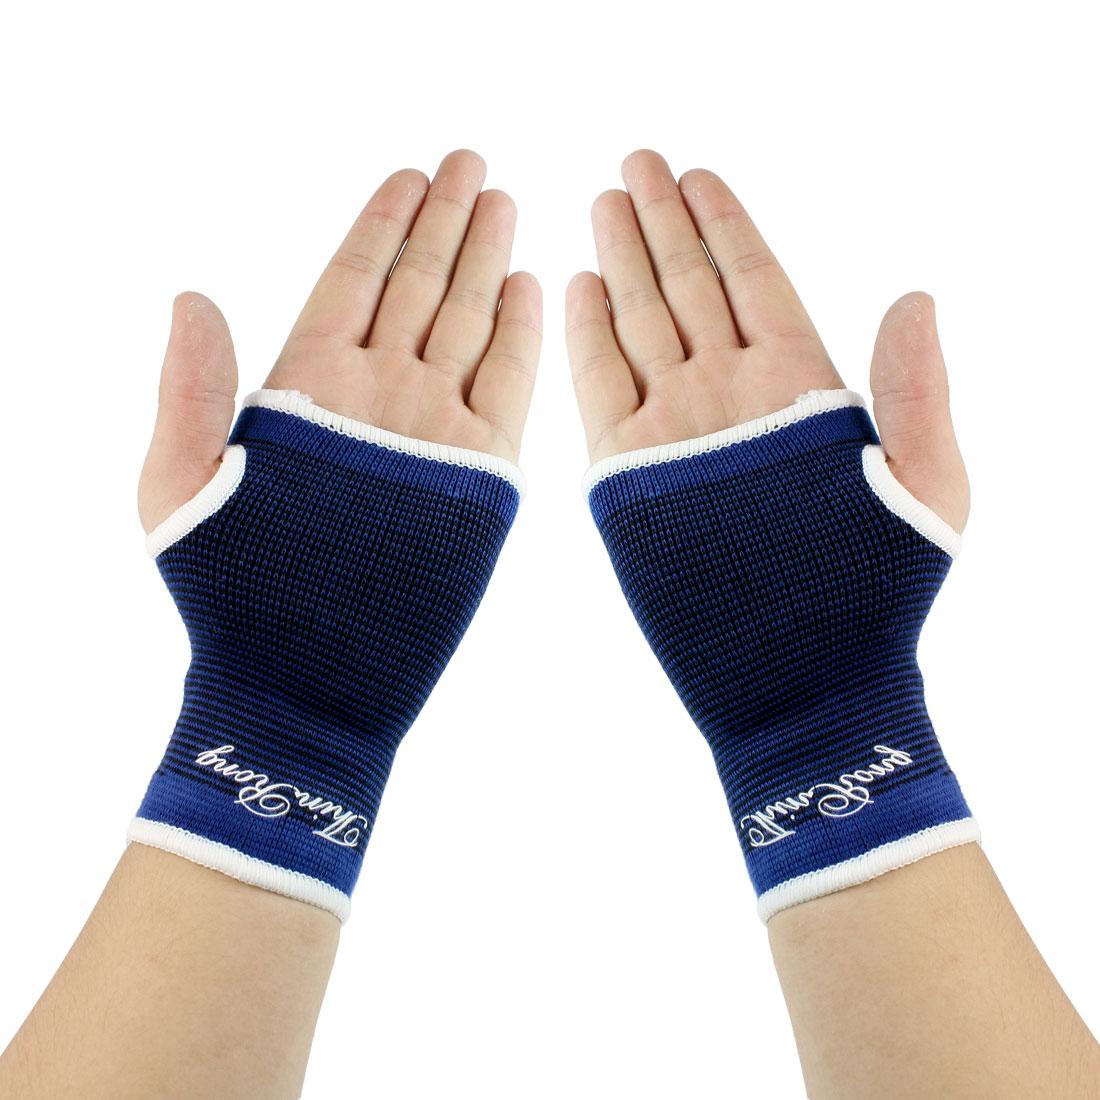 2 Pcs Black Stripe Pattern Elastic Size S Palm Support Protector Blue